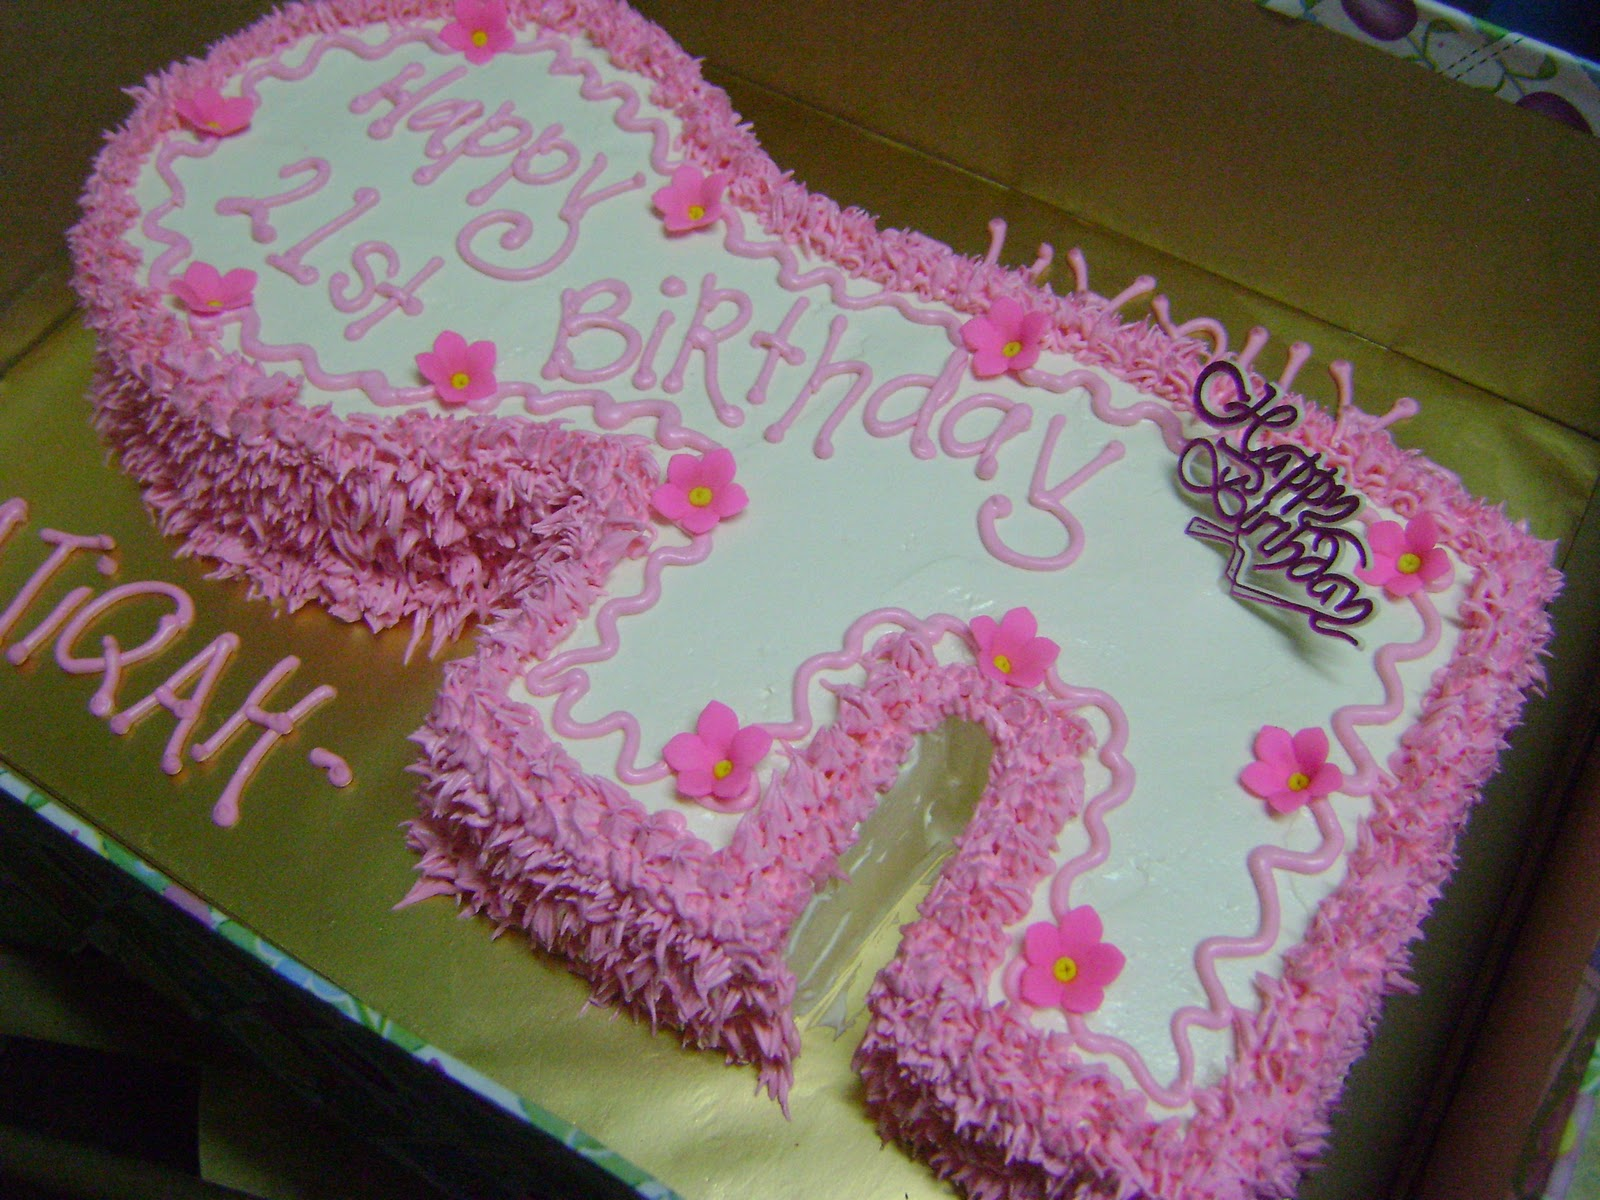 St Birthday Cake Malaysia